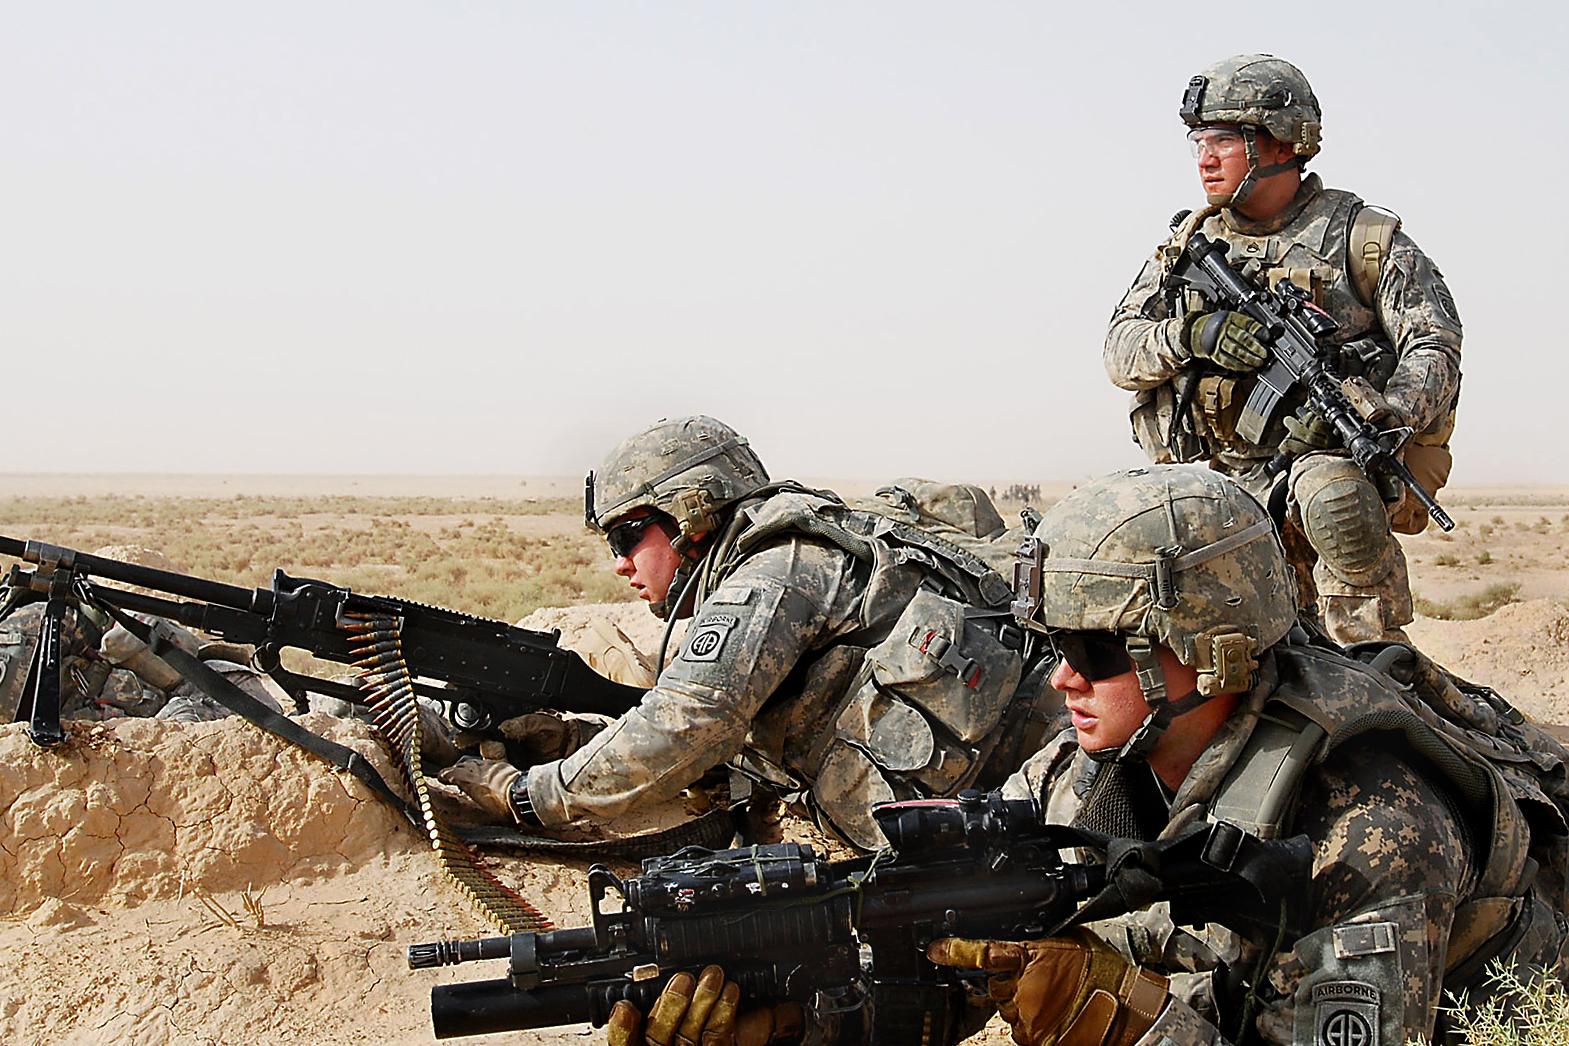 NAVER まとめ【軍事オタク必見】軍事訓練用のiPad電子書籍を米軍が無料提供